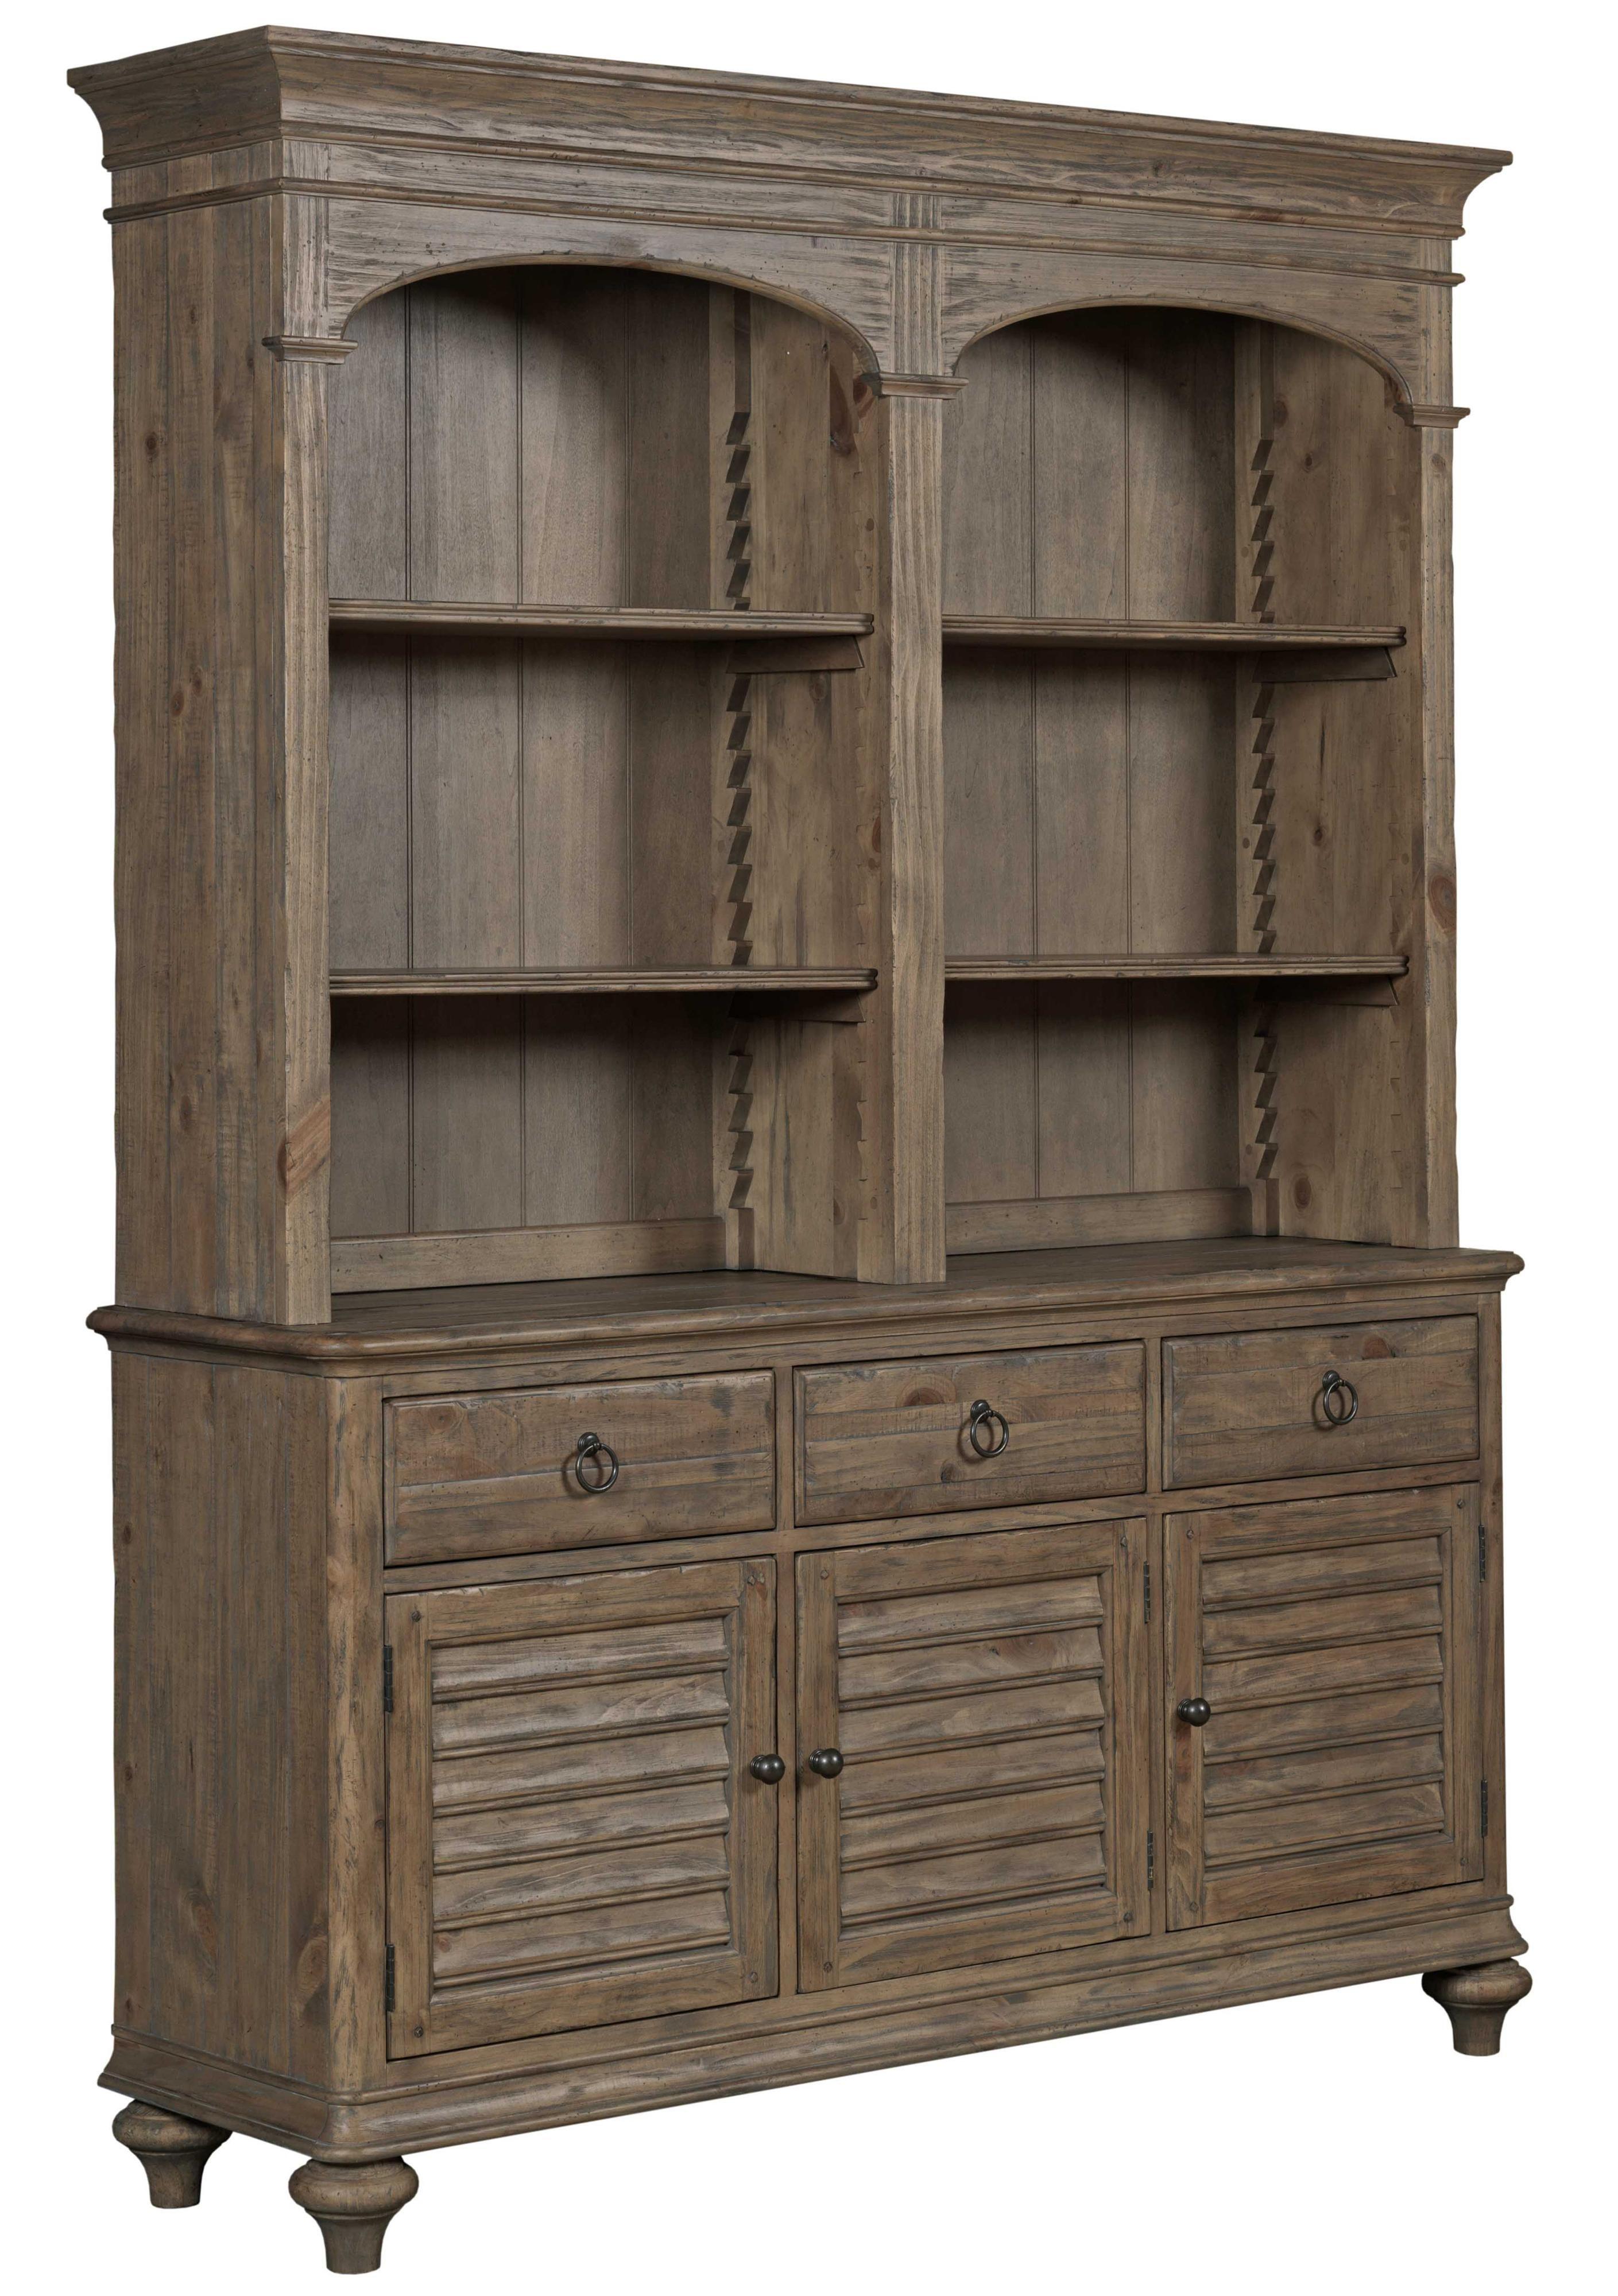 Merveilleux Weatherford China Cabinet By Kincaid Furniture At Hudsonu0027s Furniture